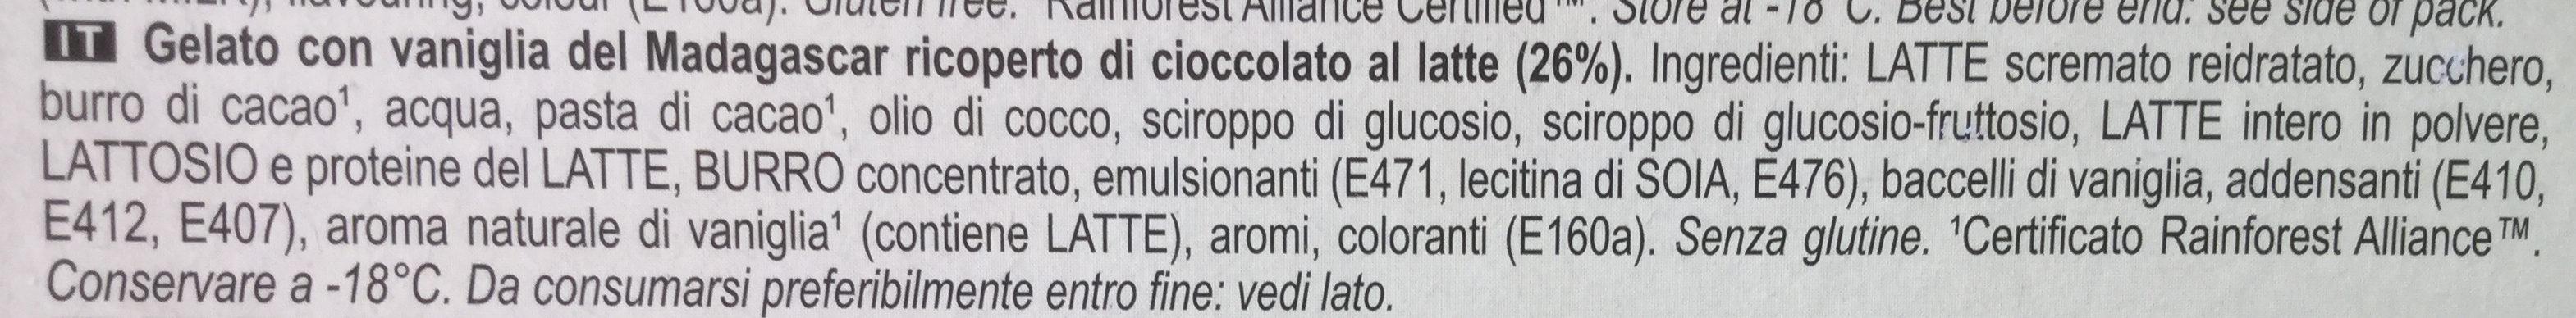 MAGNUM Glace Bâtonnet Classic 4x110ml - Ingredienti - it